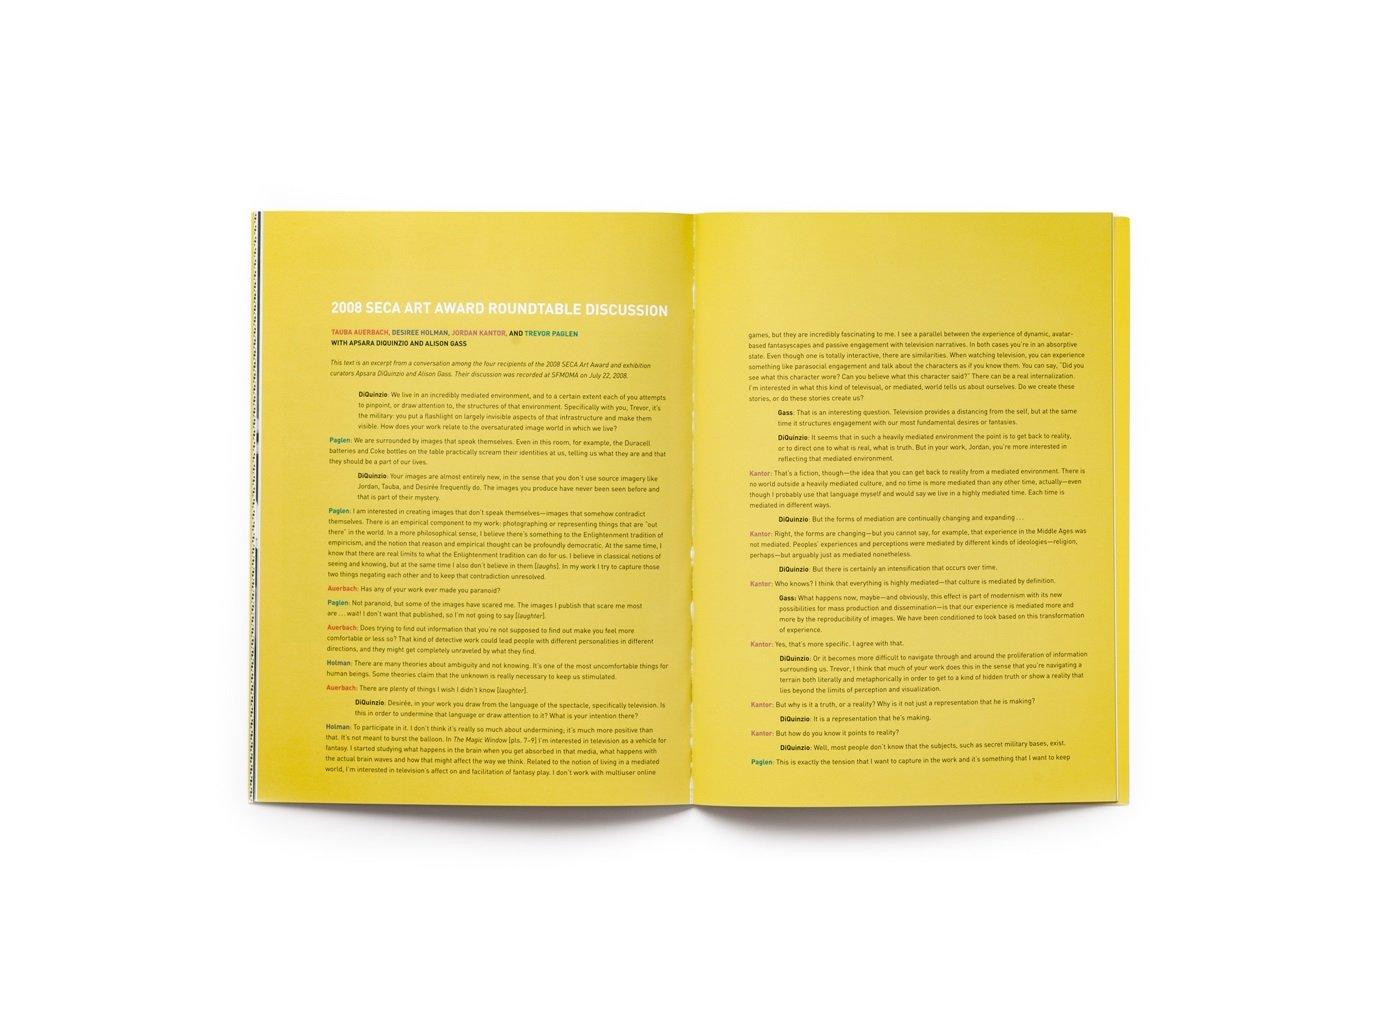 2008 SECA Art Award publication pages 16-17